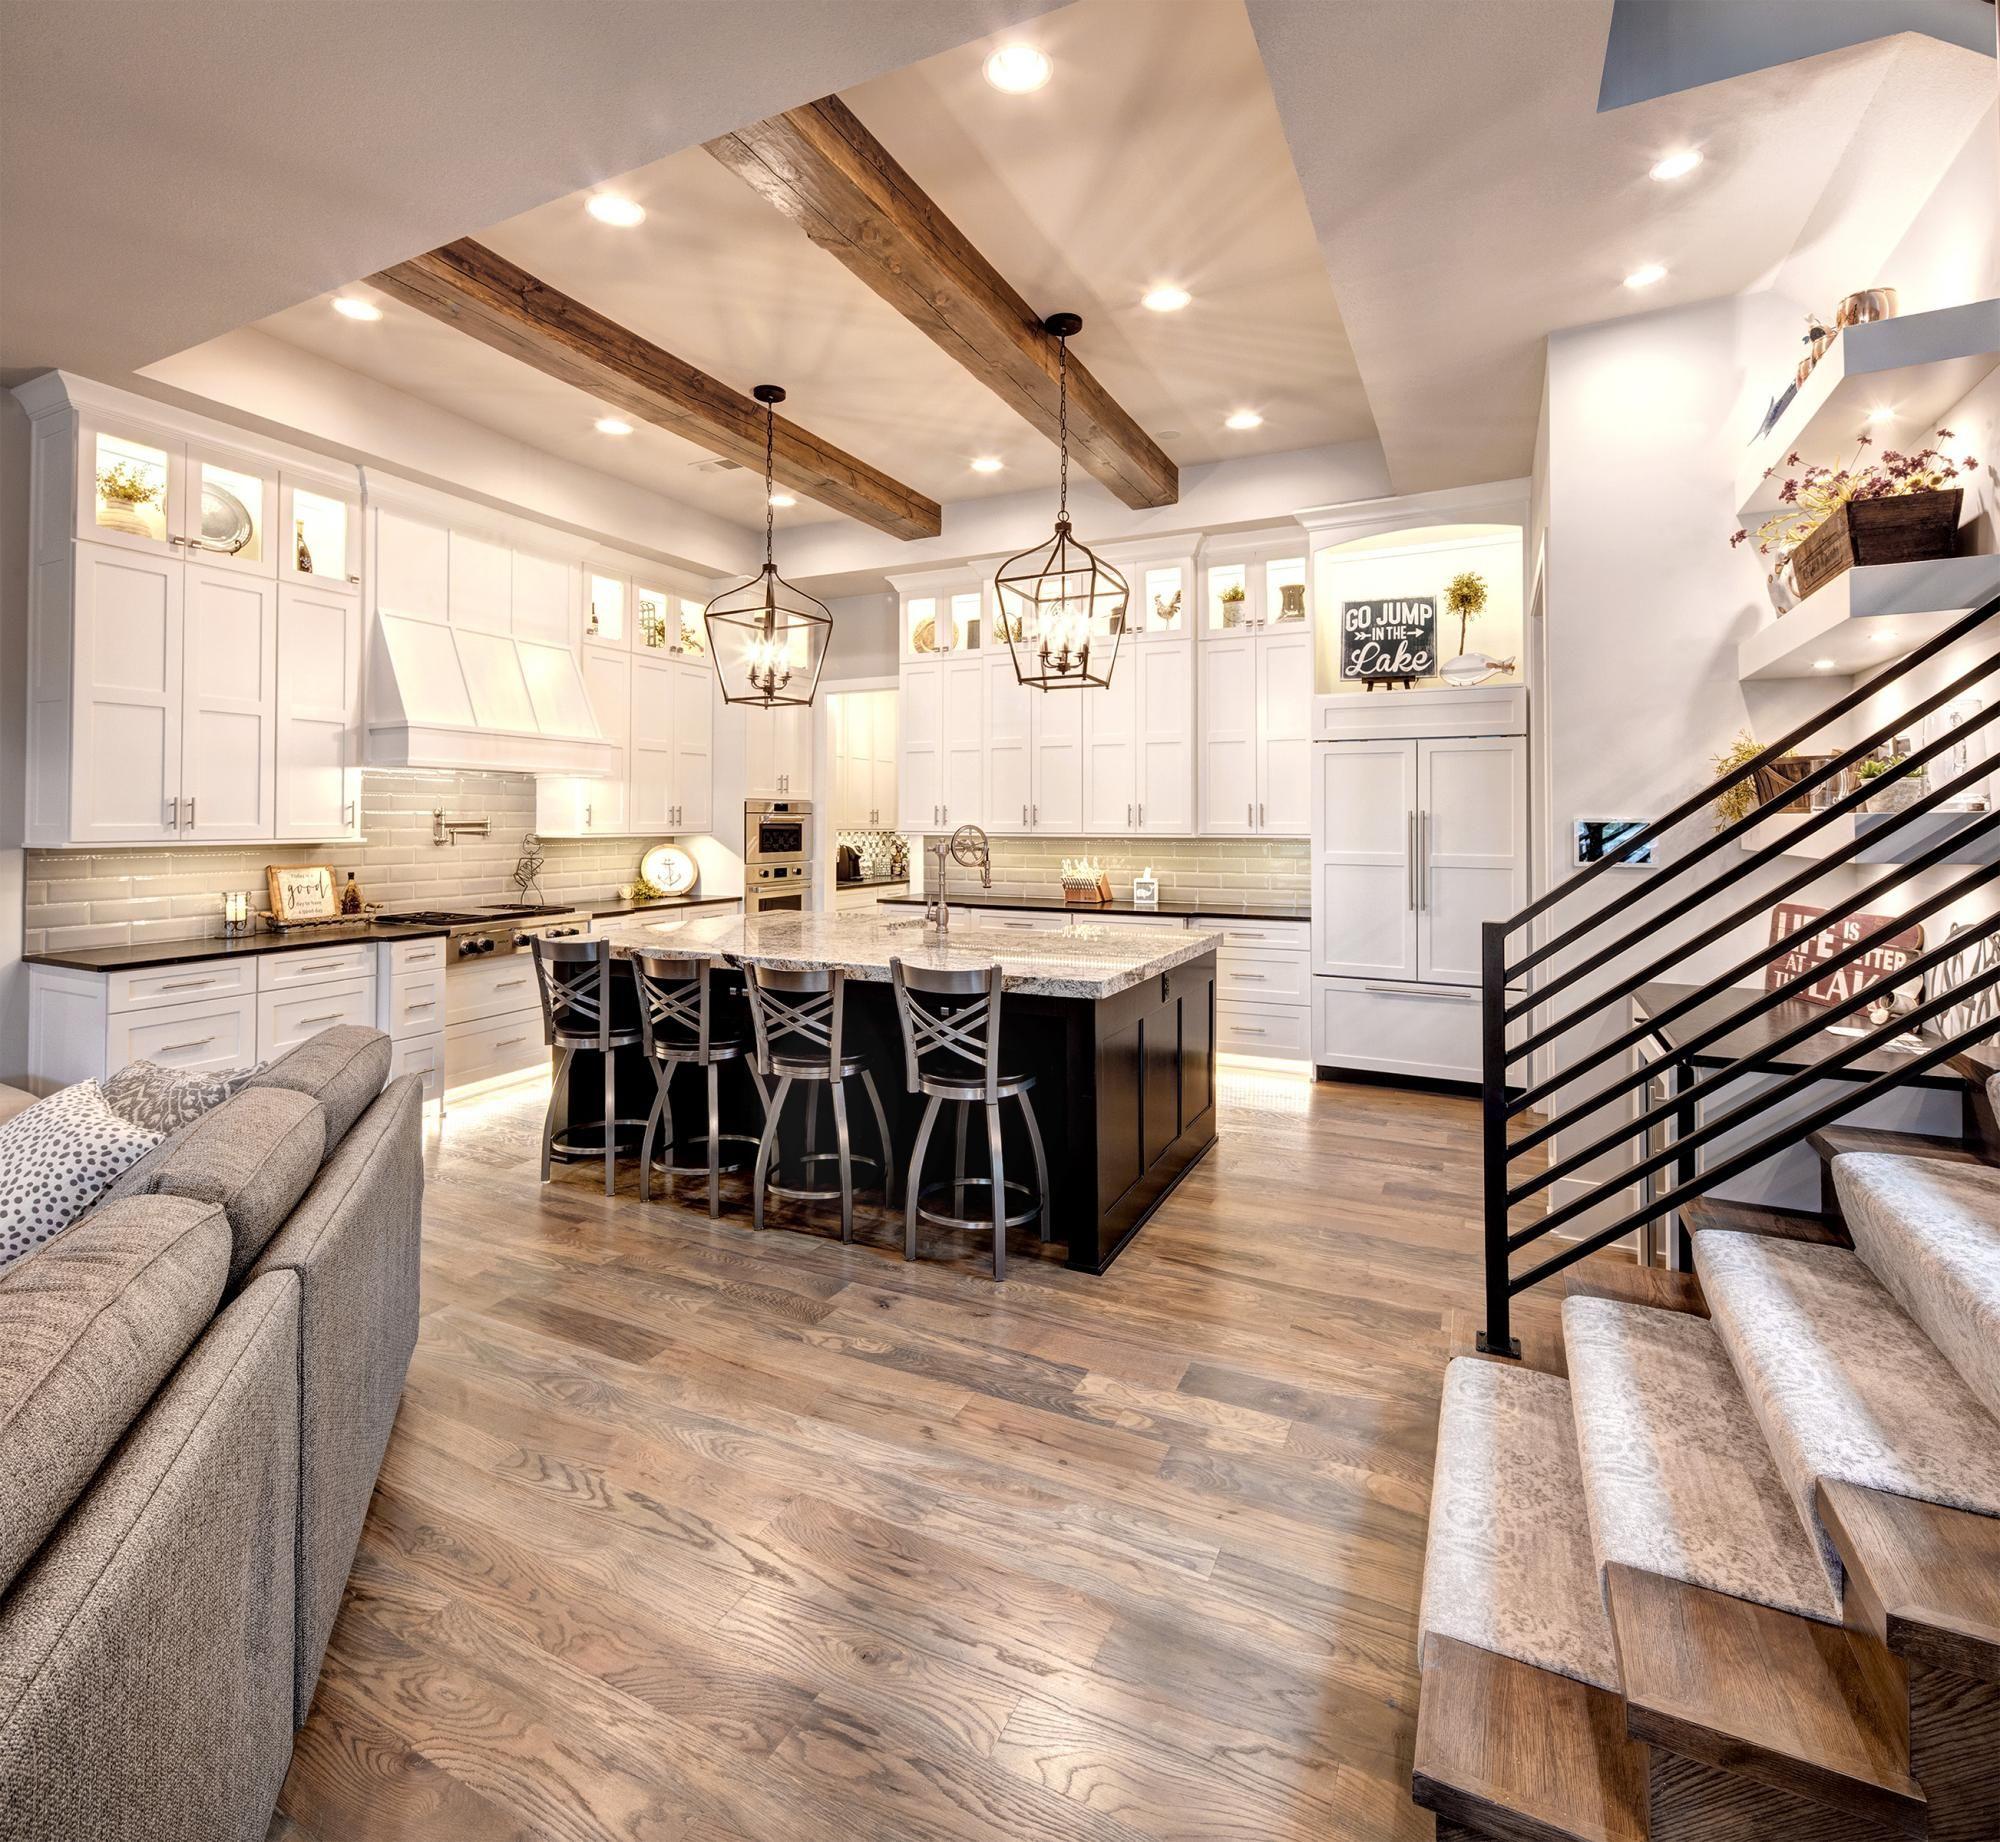 Kitchen Dining Photo Gallery Custom Homes In Kansas City Ks Starr Homes Home Living Room Remodel Home Decor